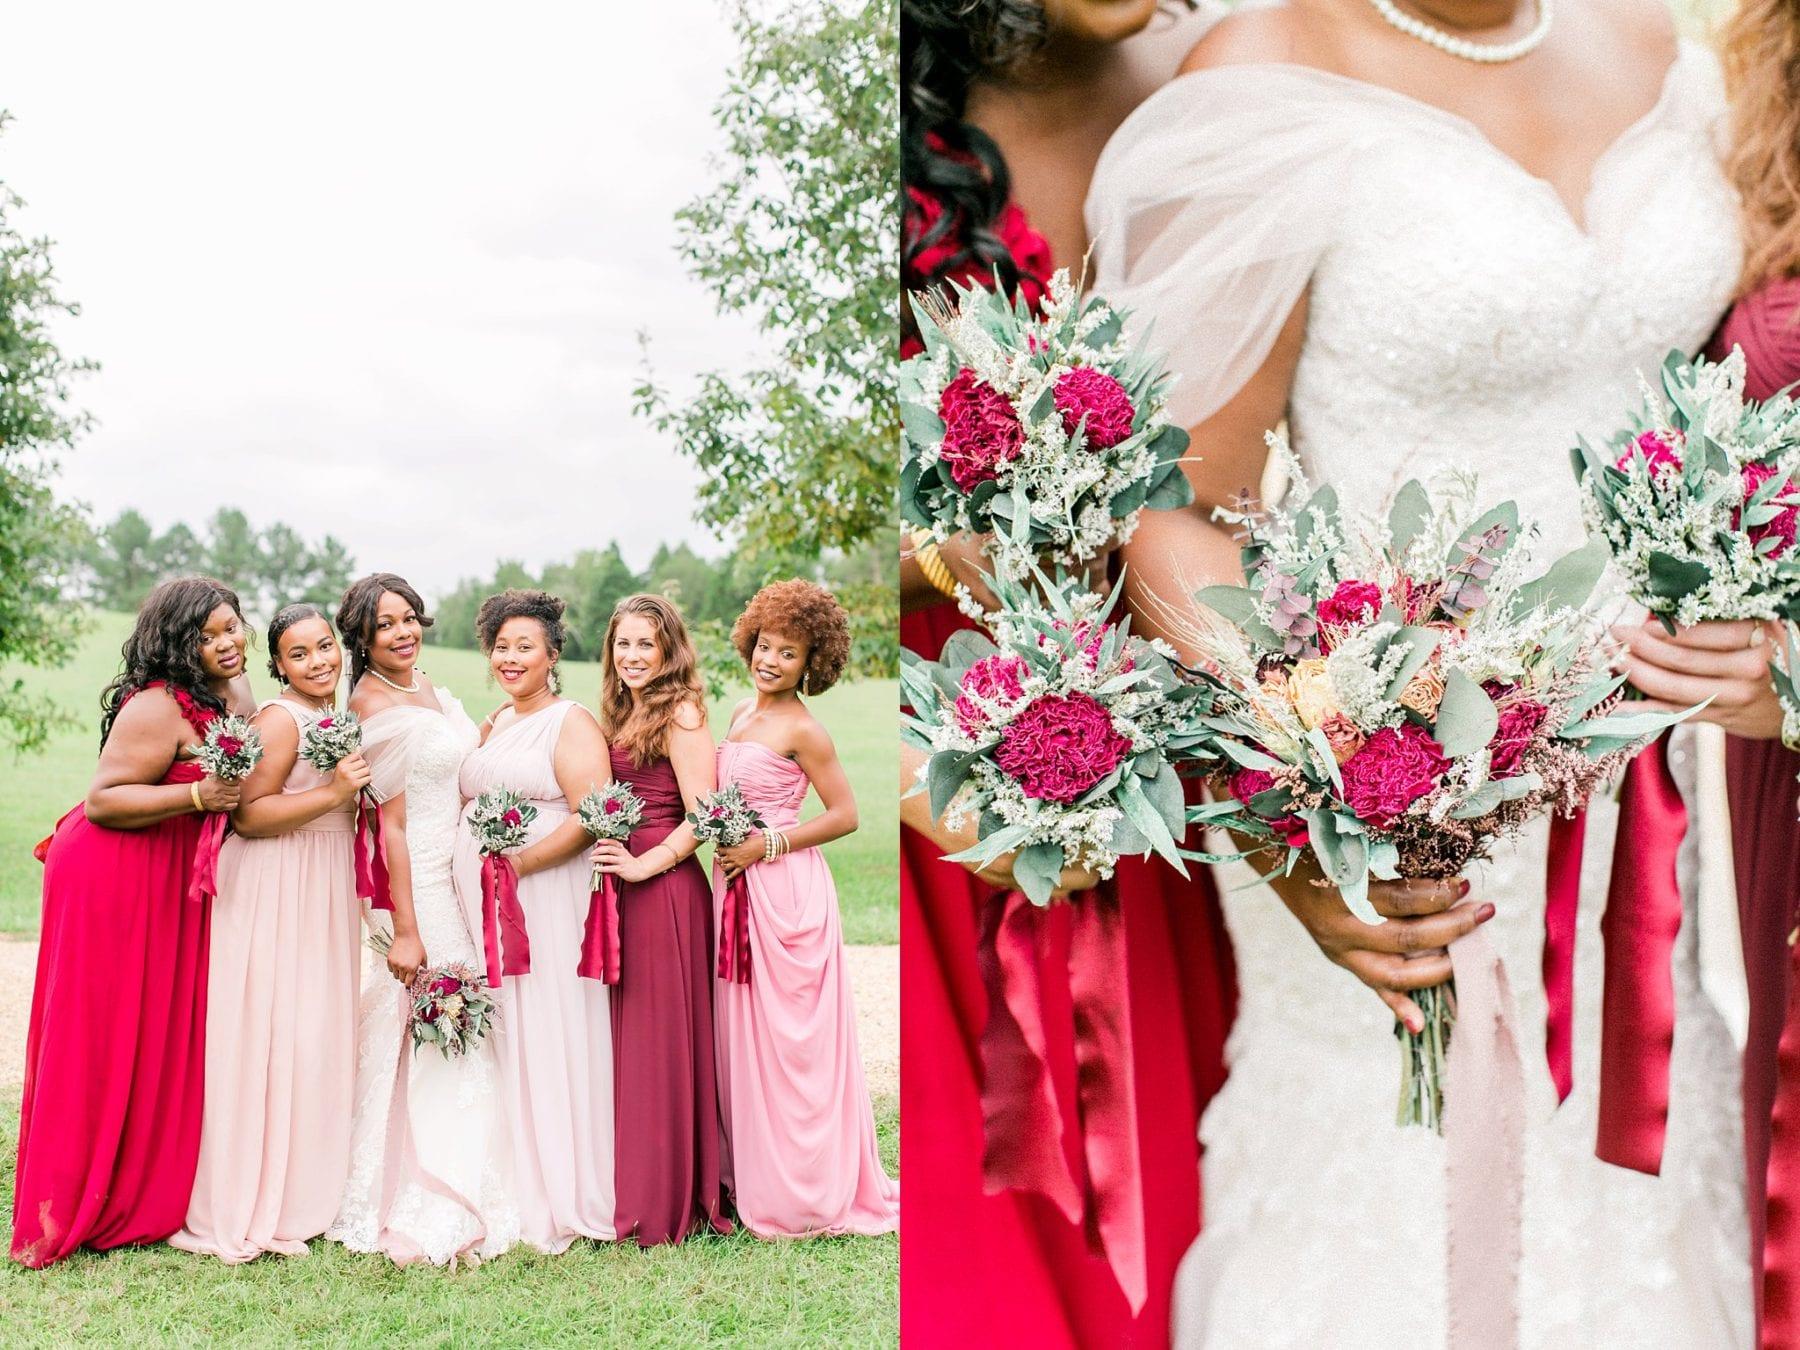 Jefferson Patterson Park Wedding Maryland Wedding Photographer Megan Kelsey Photography Jasmine & Seyi-100.jpg